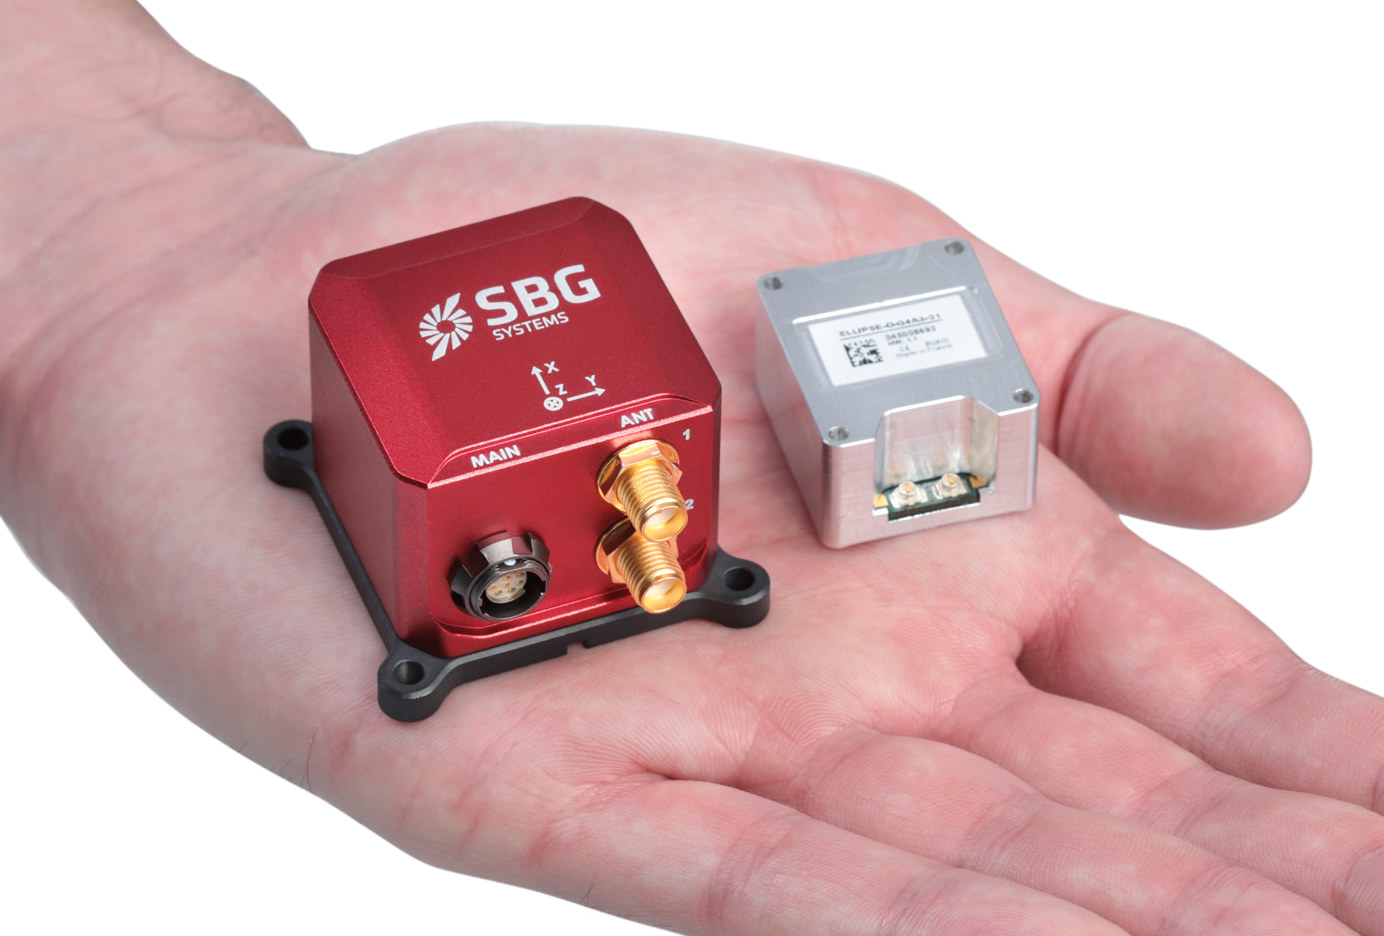 SBG Systems Ellipse-D Miniature Dual GPS INS